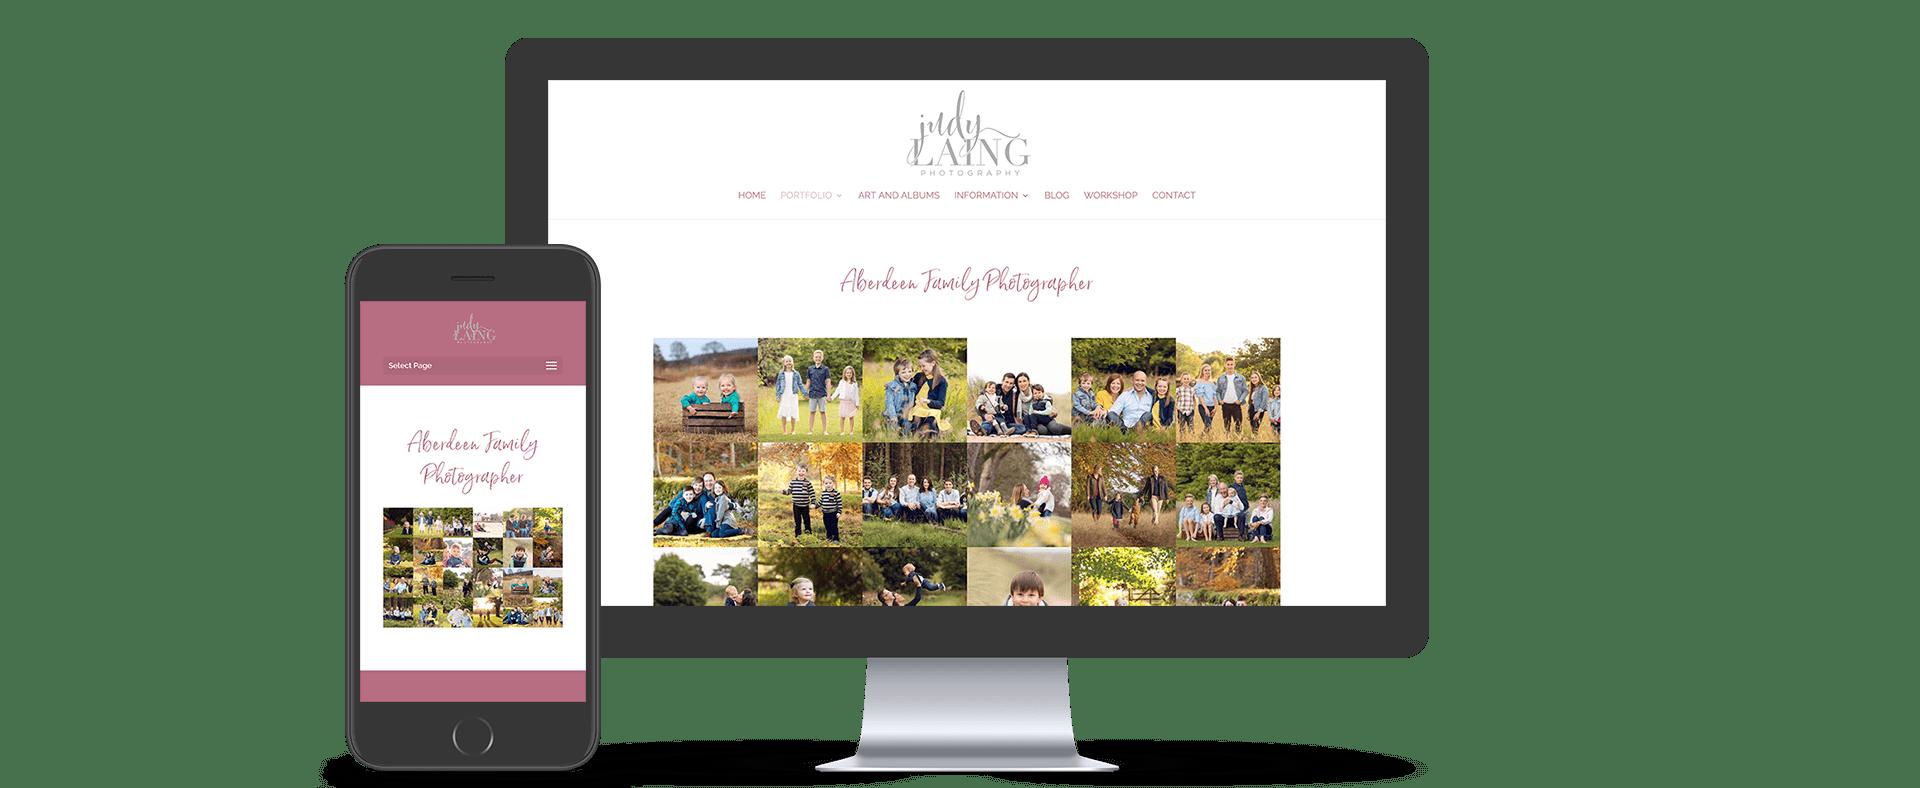 image of a desktop and mobile website for the inverness website design page